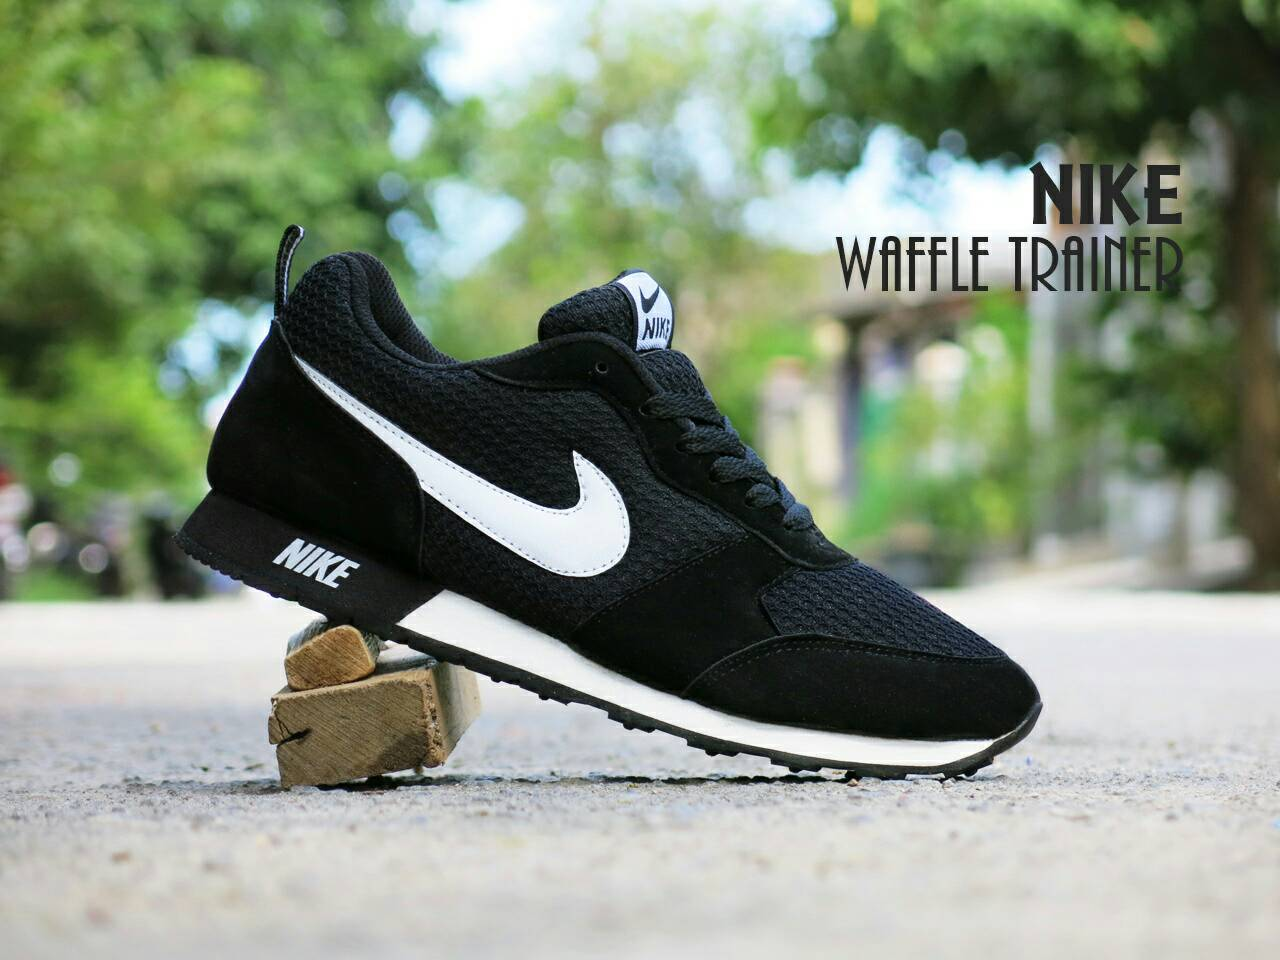 Jual Sepatu Olahraga Nike Waffle Trainer Hitam Putih cocok untk pria ... 712fbf6947